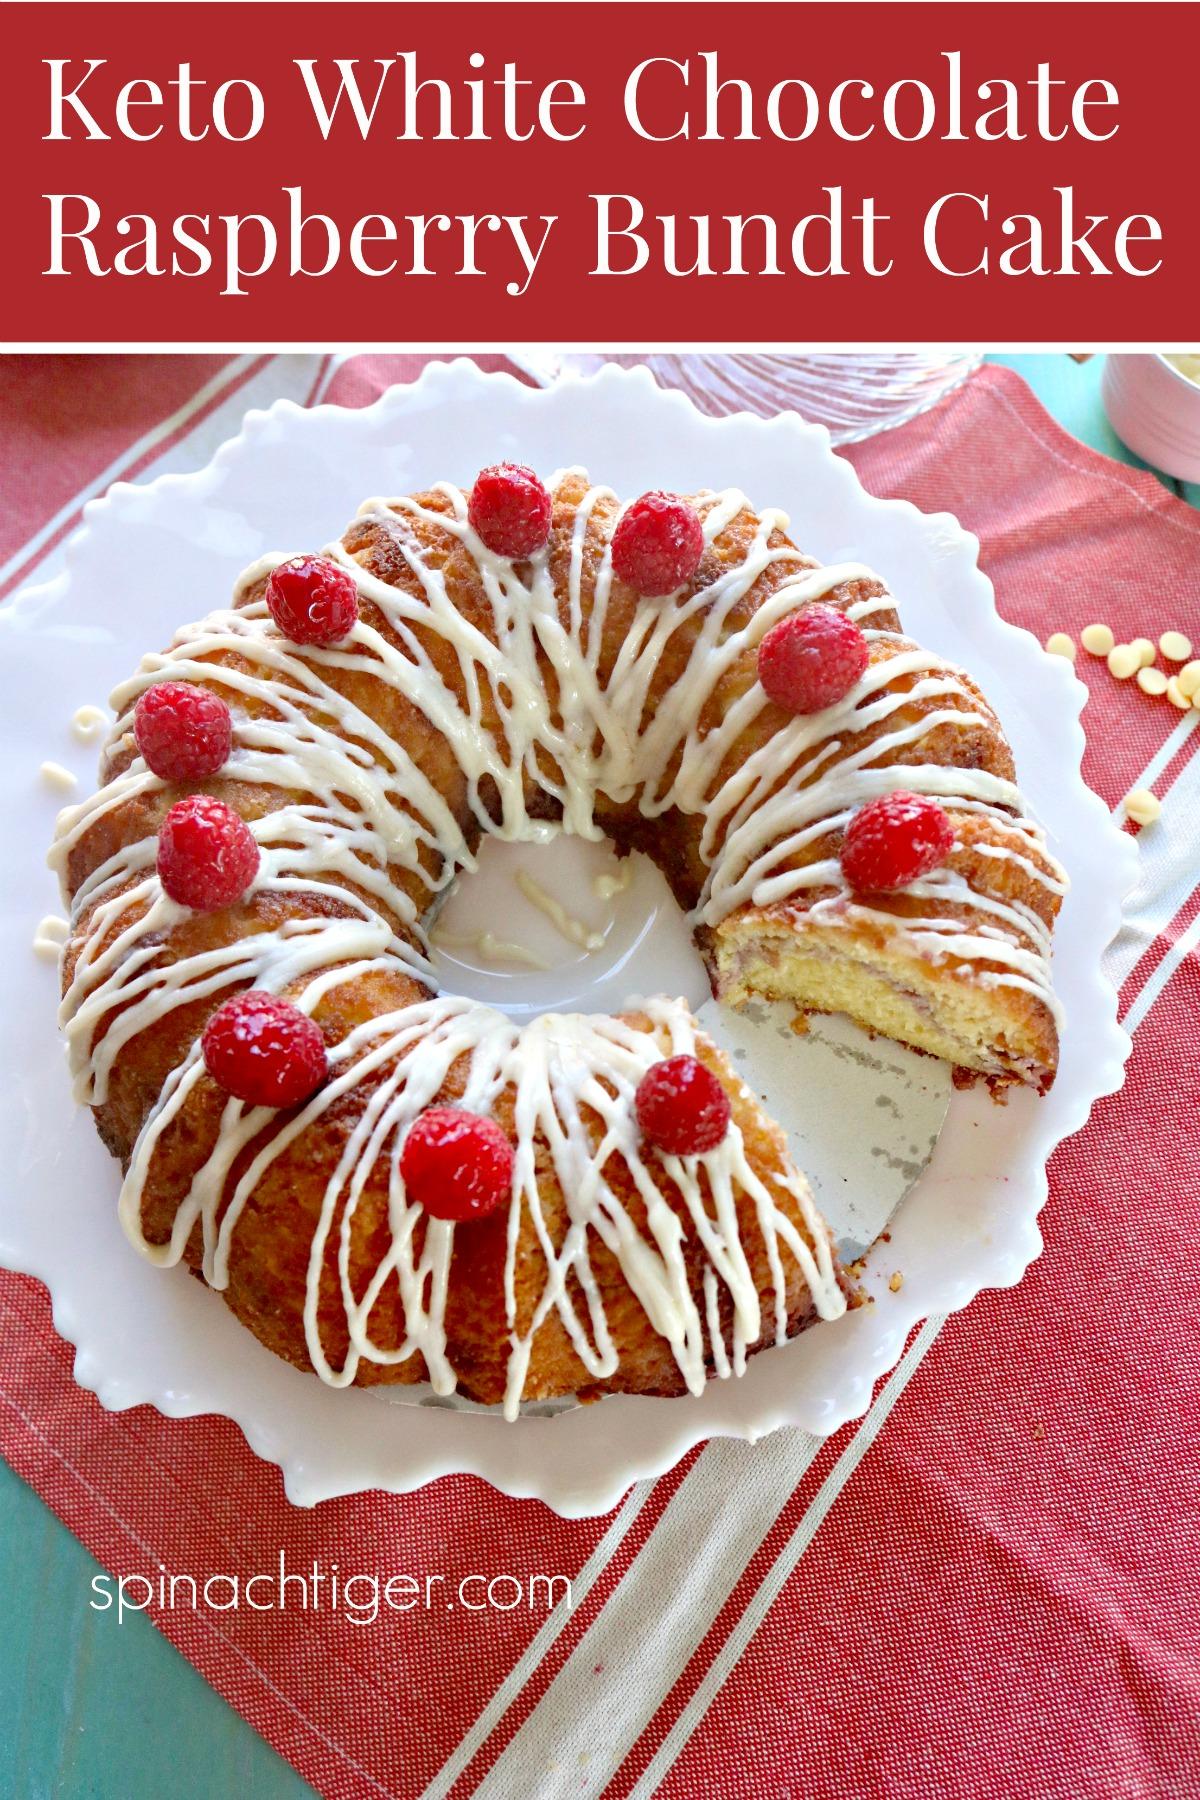 Keto White Chocolate Raspberry Bundt Pan with Tips on how to make a bundt cake that doesn't stick. #ketoraspberrywhitechocolatebundt #ketobundt #ketocake #ketodessert #glutenfree #paleo #swerve #choczero #sugarfreewhitechocolate via @angelaroberts